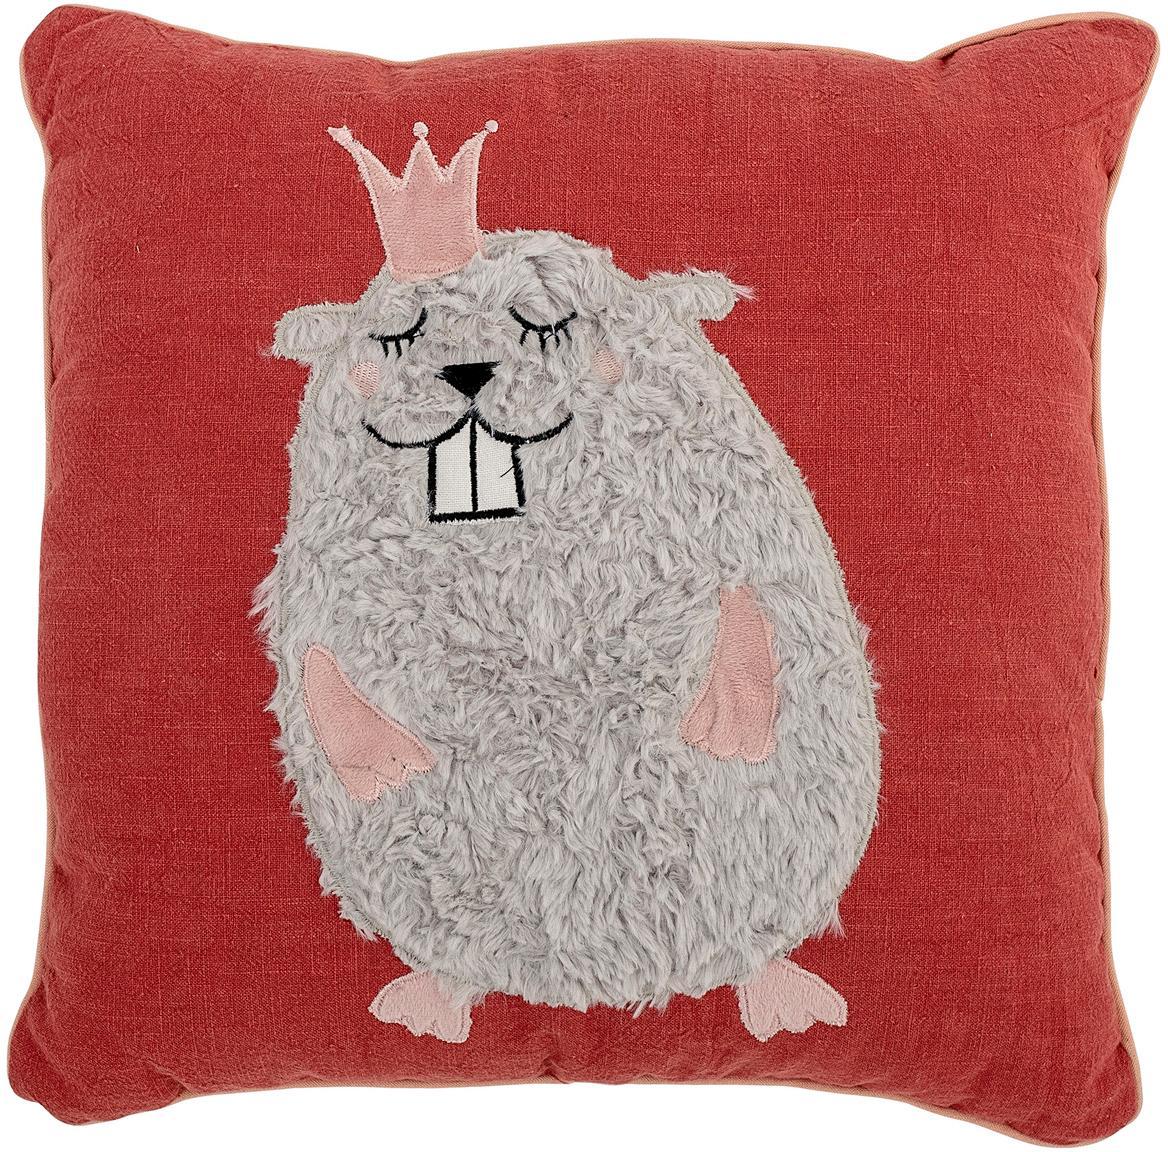 Kissen Hamster, Bezug: 70% Baumwolle, 30% Polyes, Rot, Grau, Lachsfarben, 40 x 40 cm